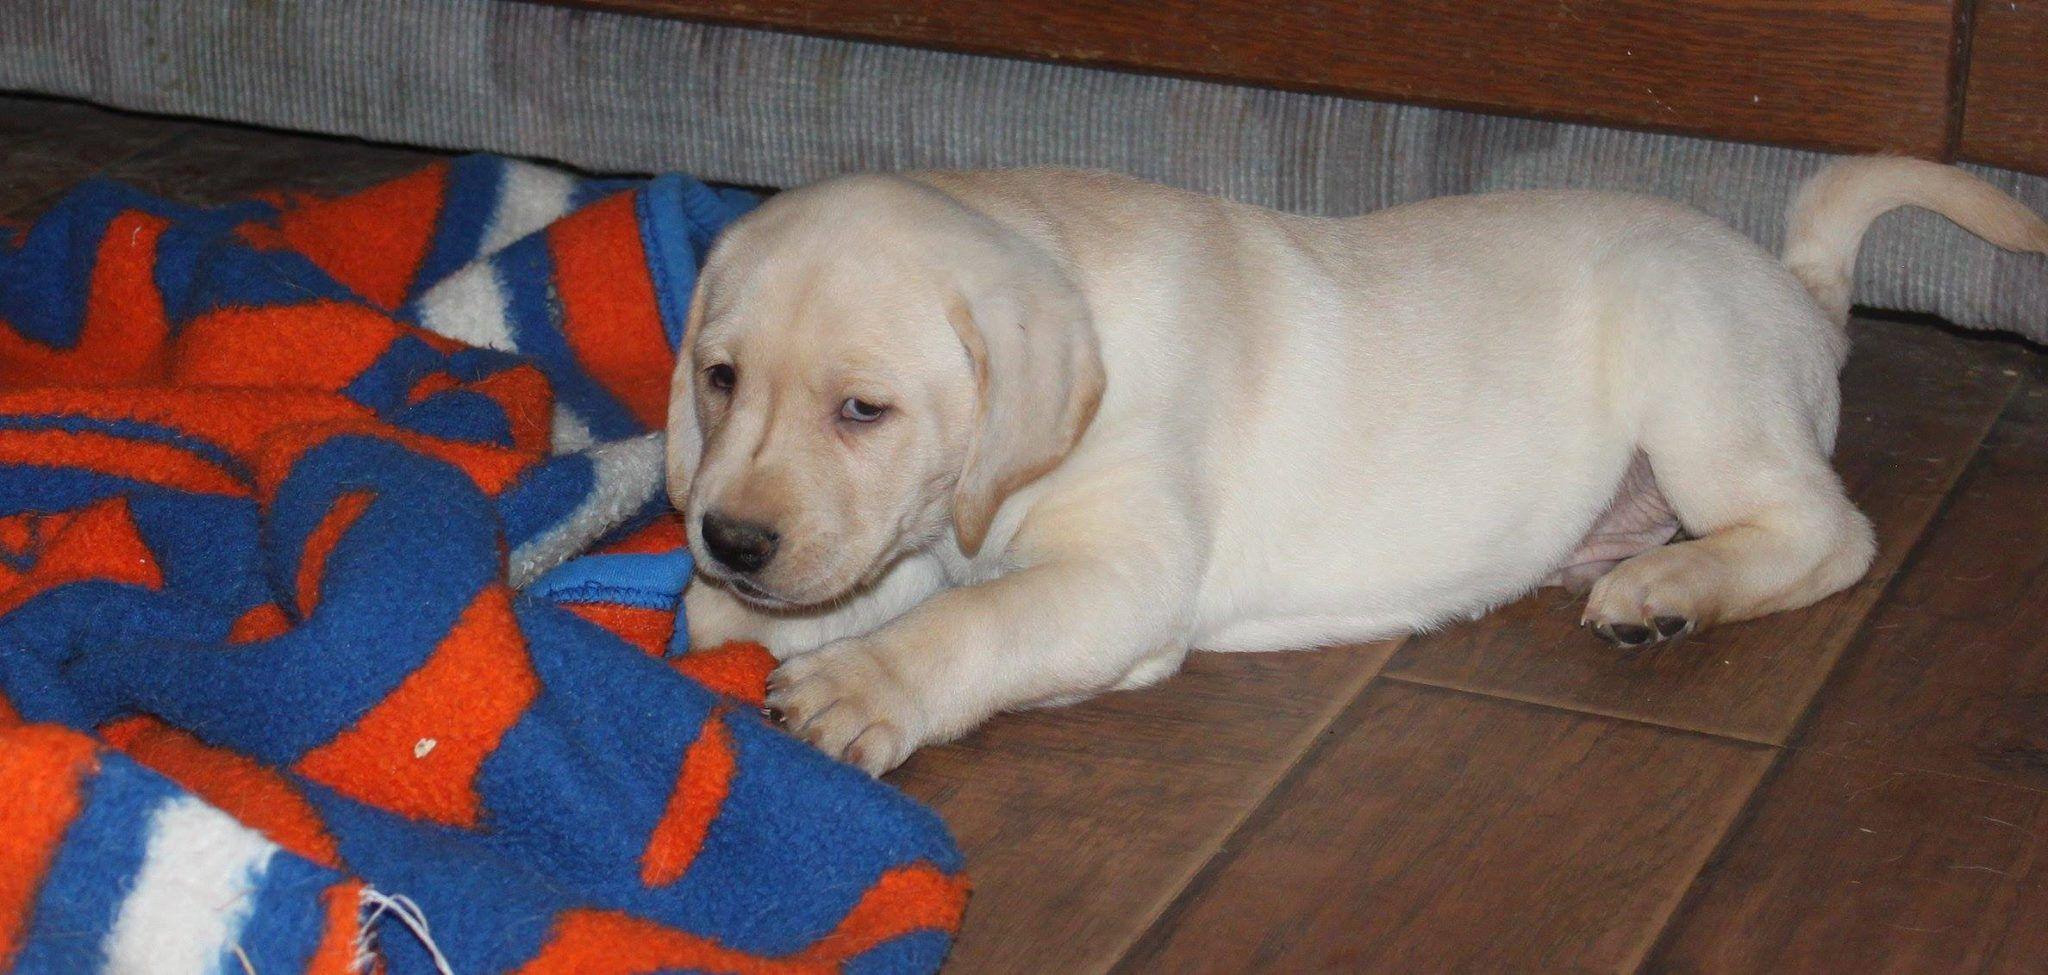 Mayhugh Kennels Still Have 1 Yellow Lab Puppy For Sale 970 520 6949 Yellow Lab Puppy Lab Puppy Puppies For Sale